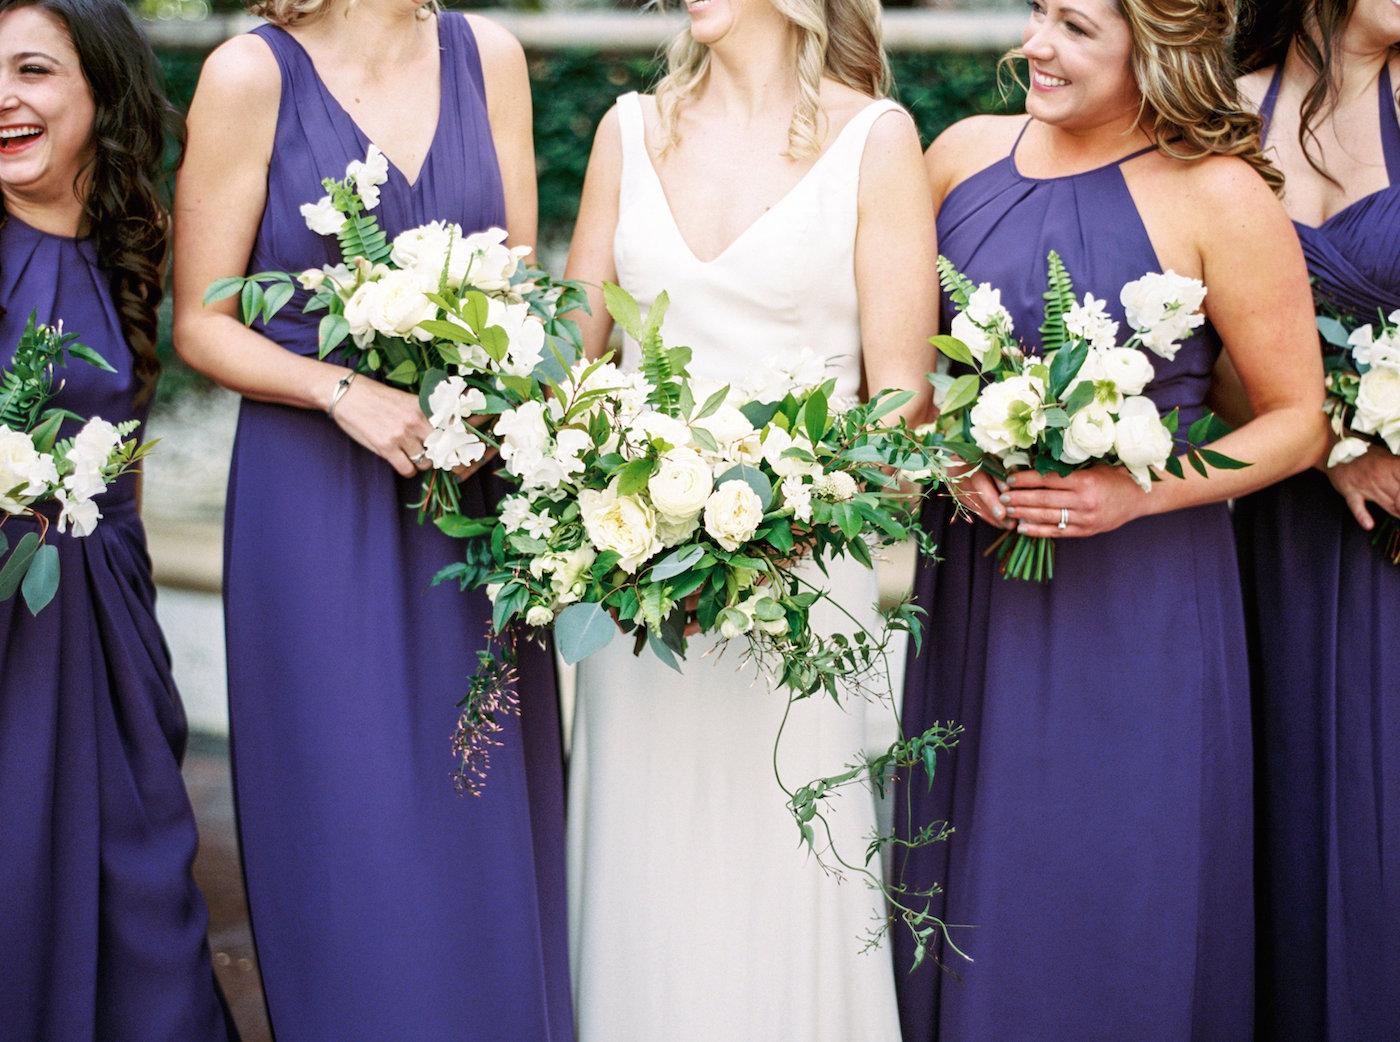 Royal Blue Bridesmaids Dresses 1